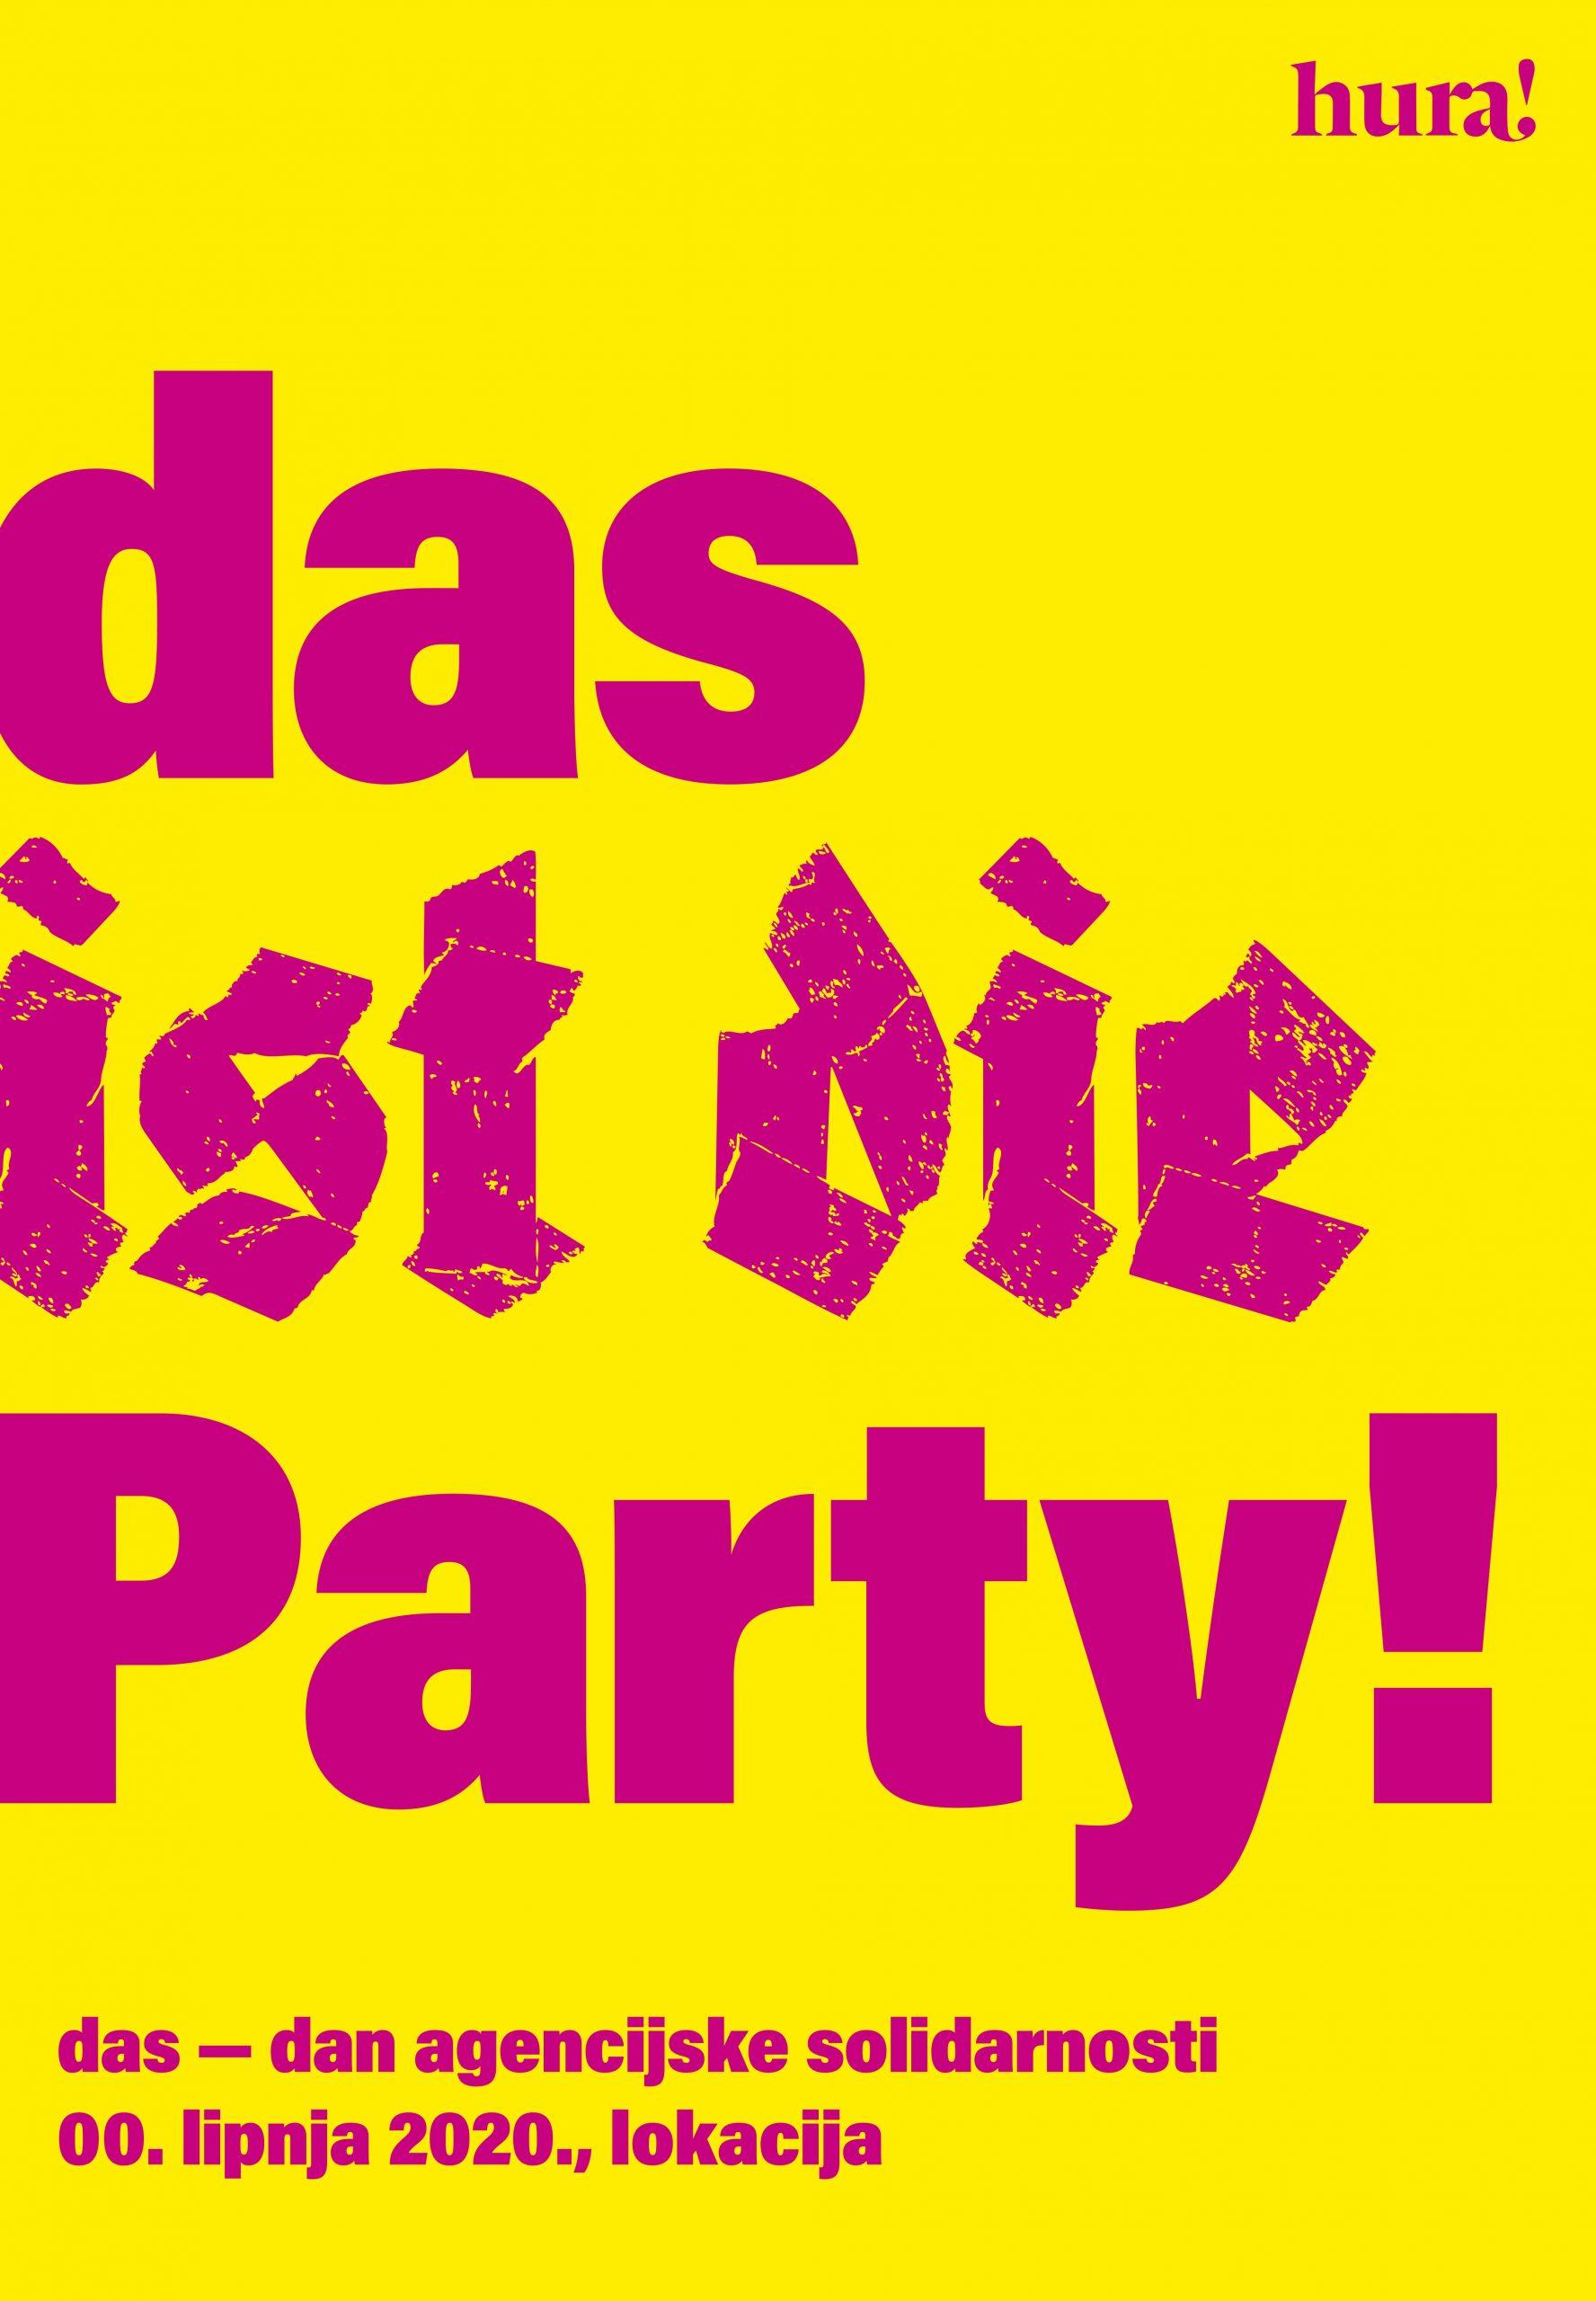 DAS IST DIE PARTY Agency: BBDO Zagreb Creative Director: Martina Pavić Designer: Maja Perica Copywriter: Maja Perica & Martina Pavić